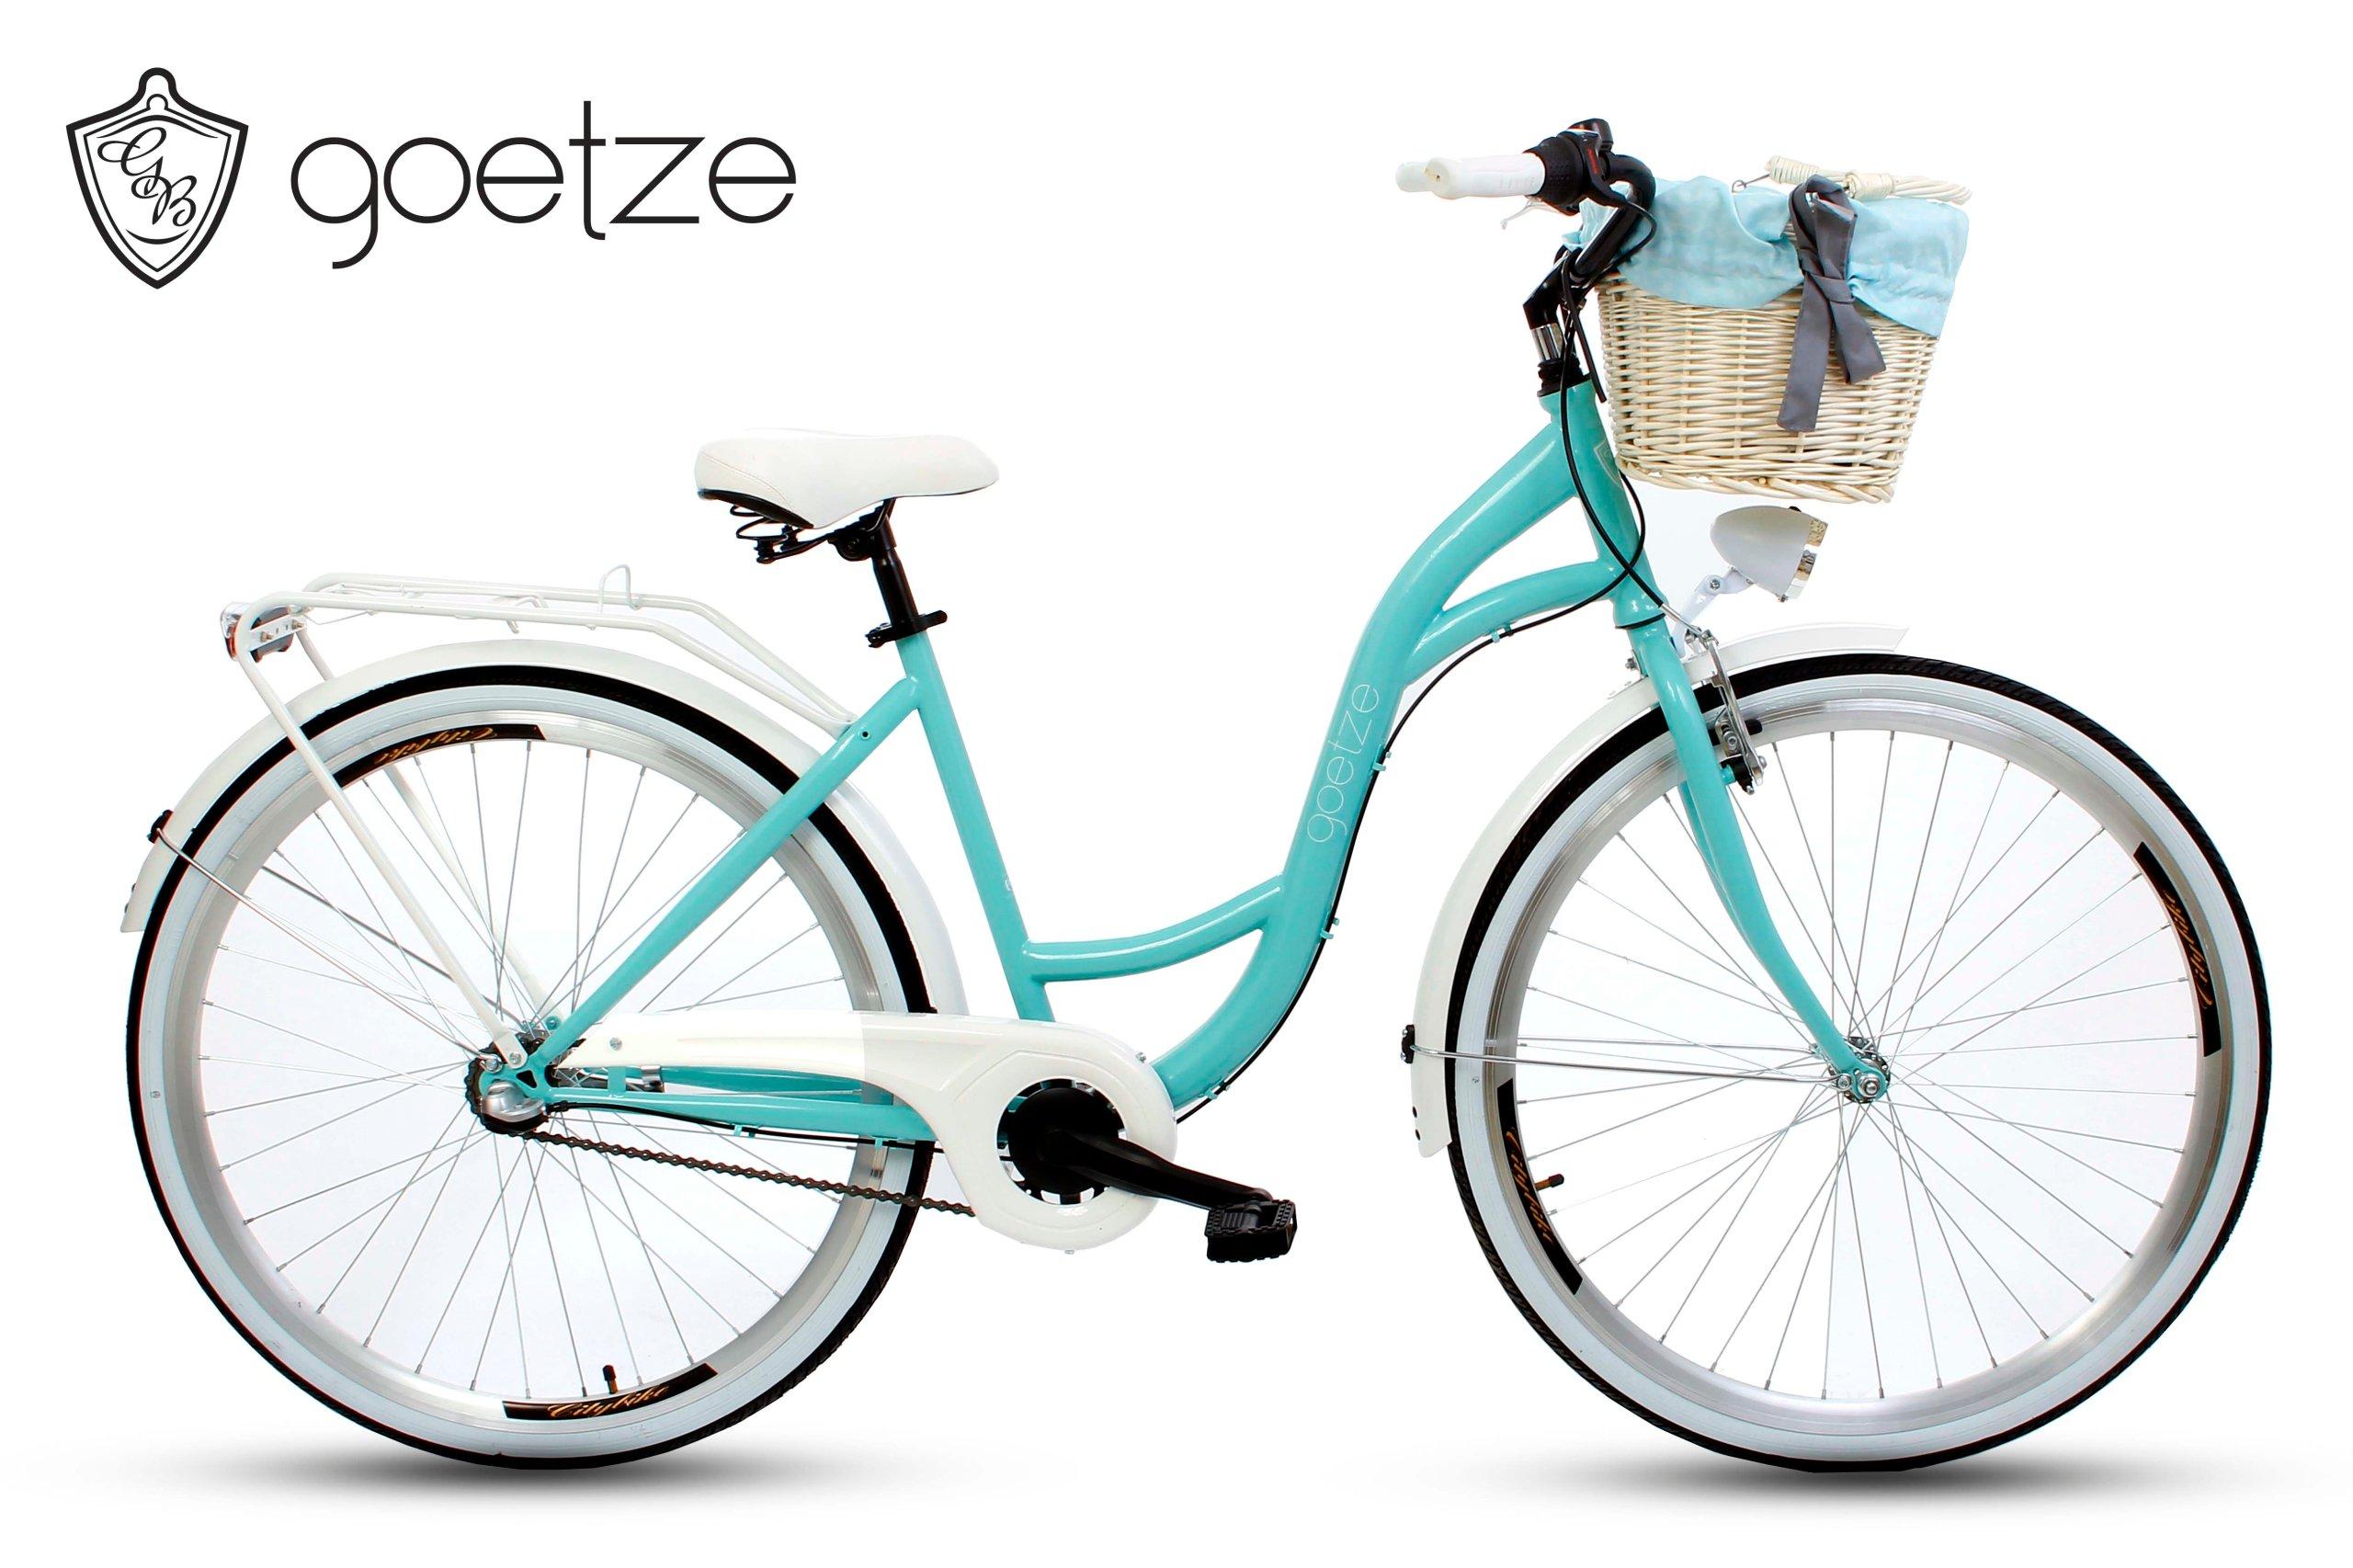 Damenfahrrad Fahrrad mit Korb Citybike Retro Goetze Style 28 Zoll 3 Gang